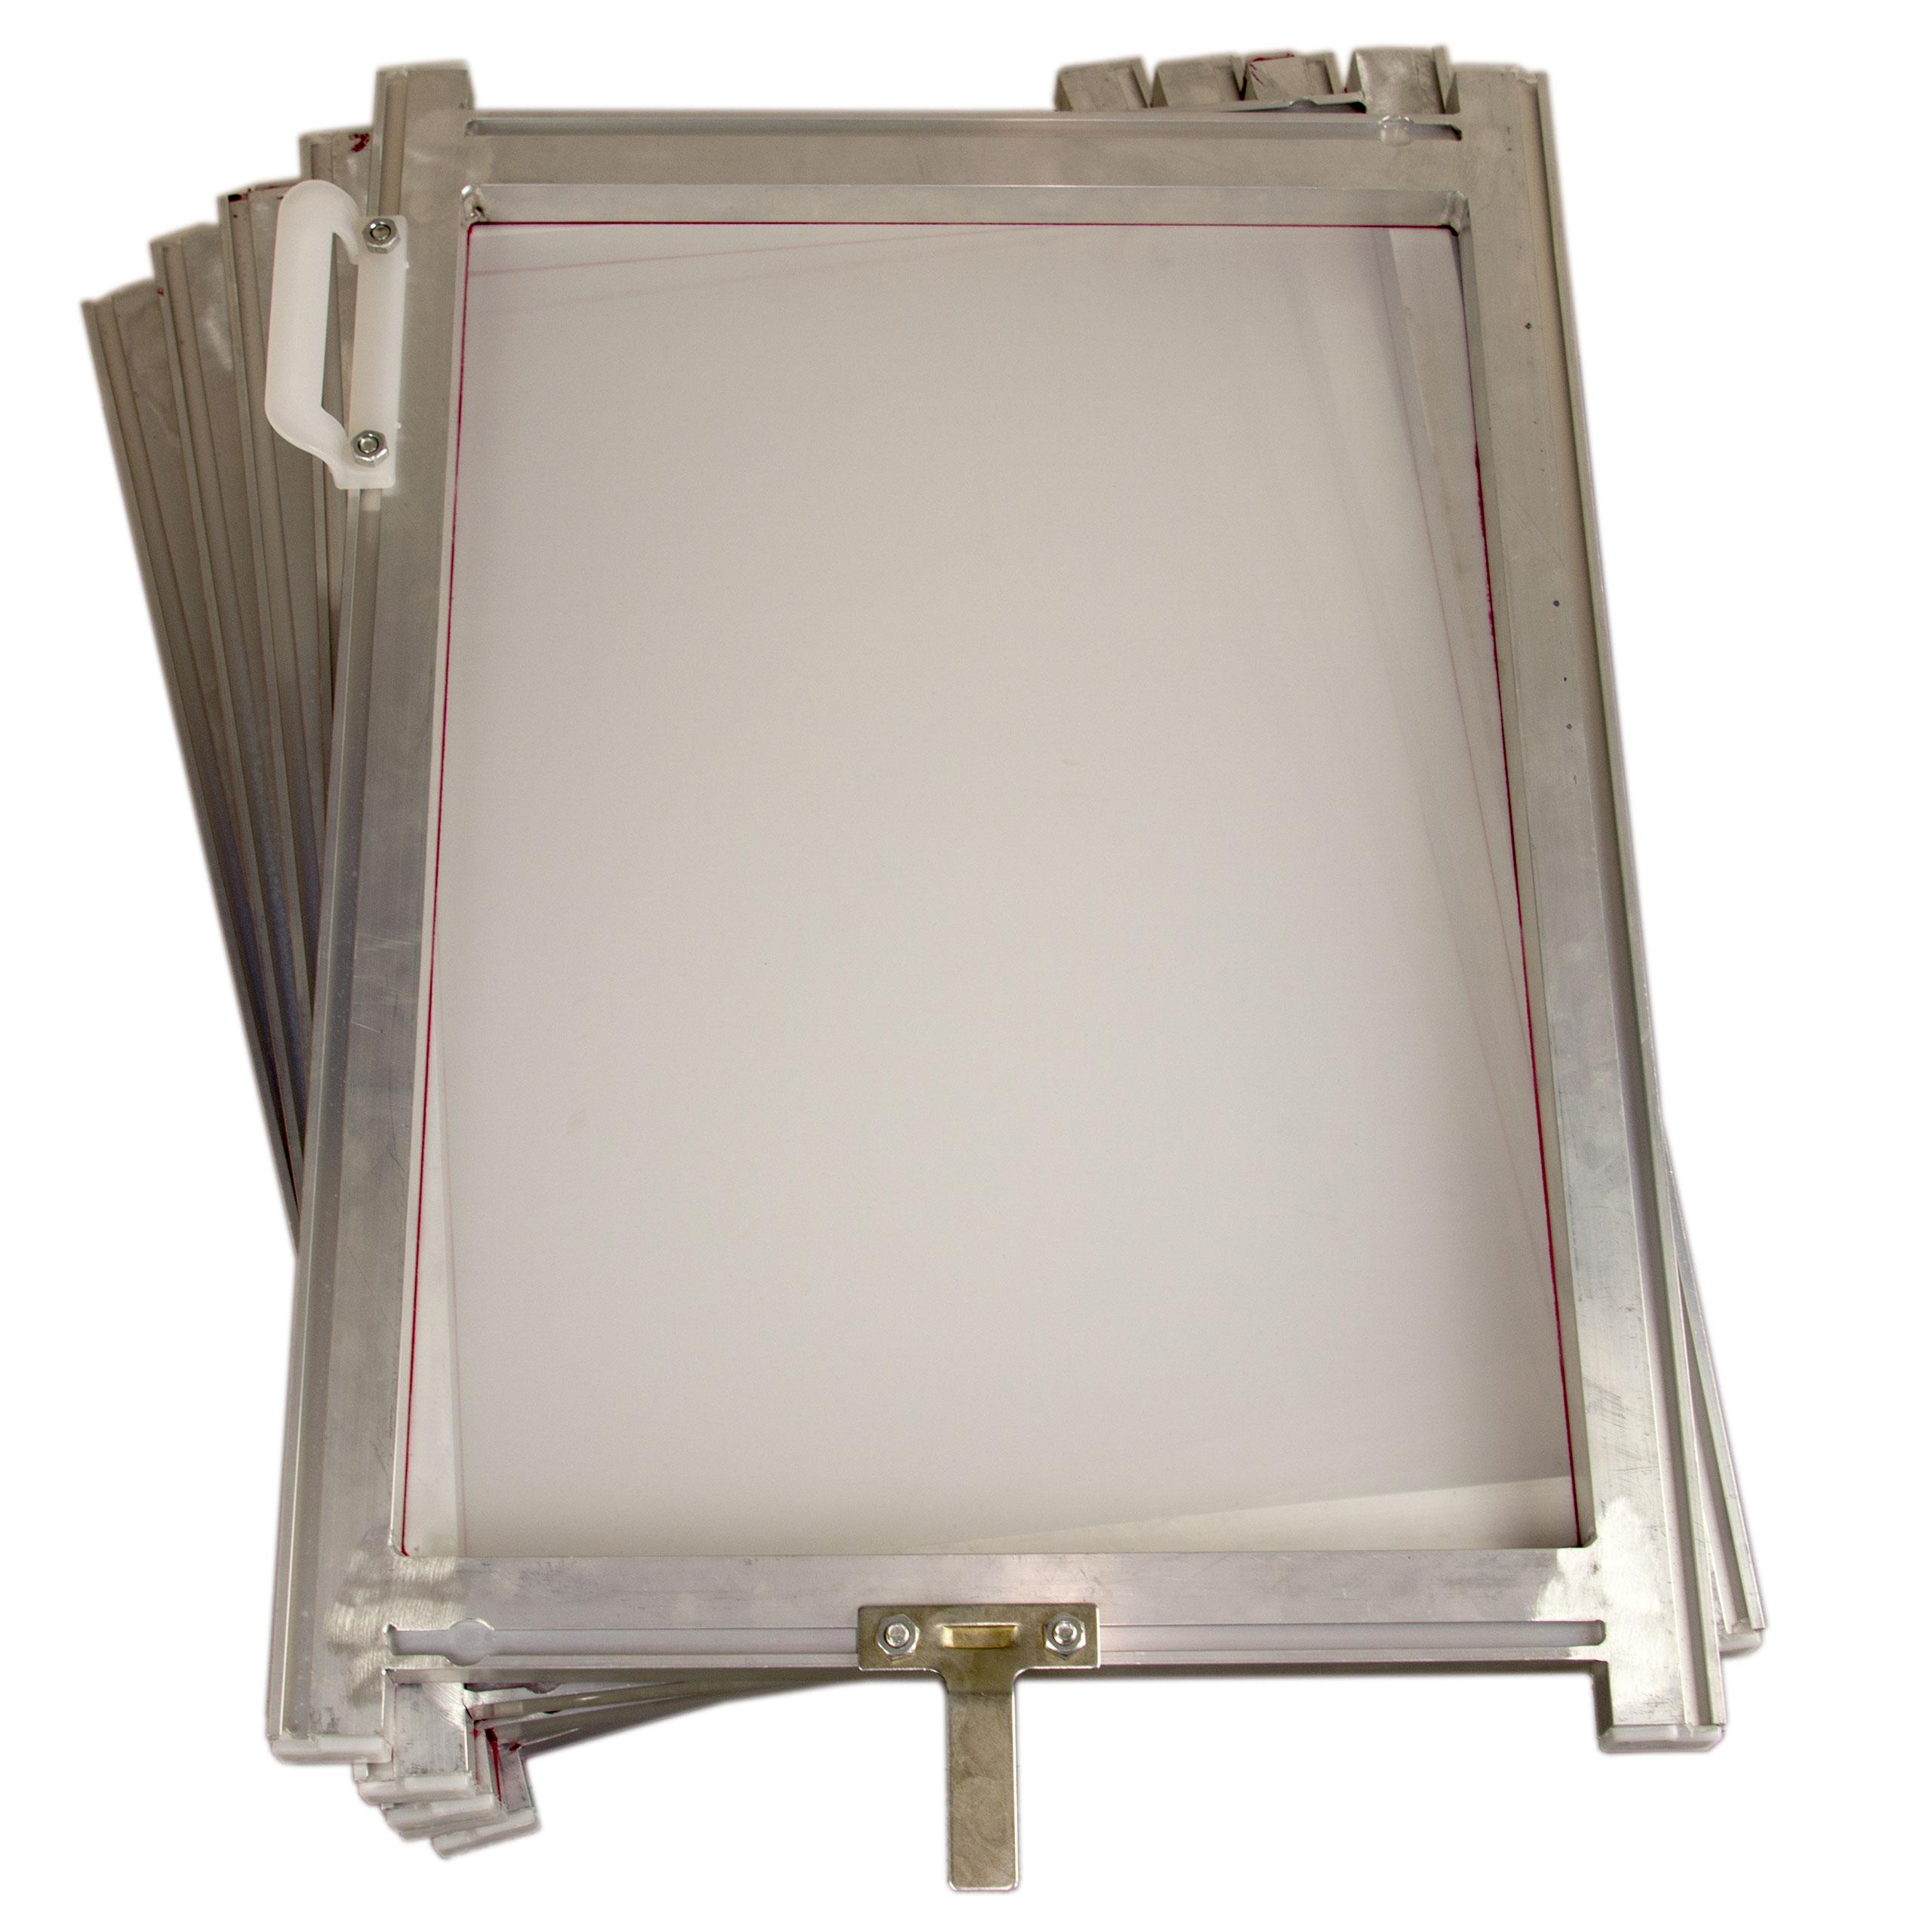 5 x Siebdruckrahmen 54T Line Table 16x22 Zoll Textildruck universal DIN-A3+